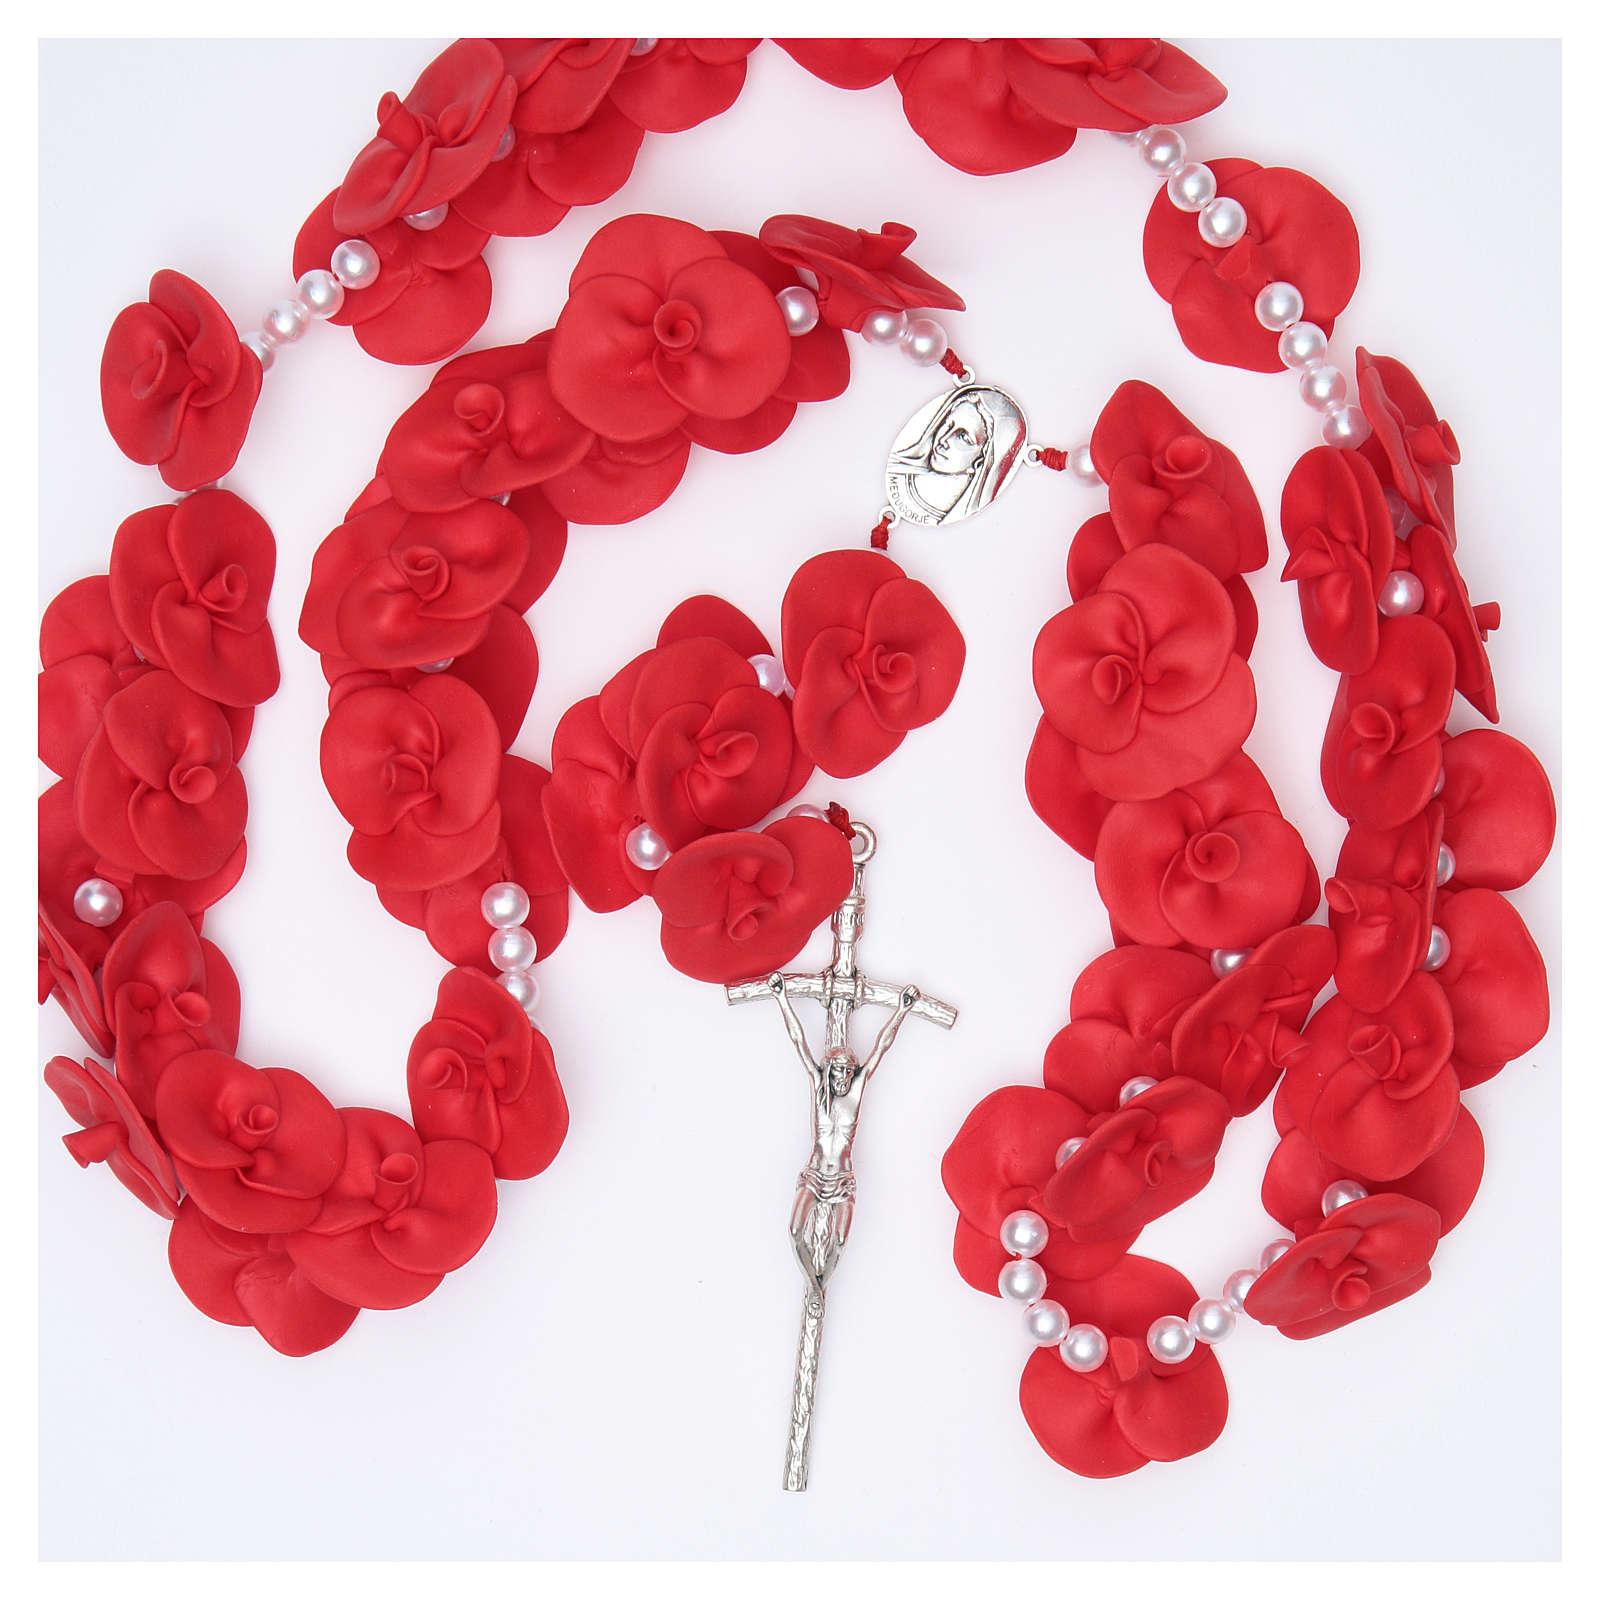 Rosario para colgar Medjugorje rosas rojas 4